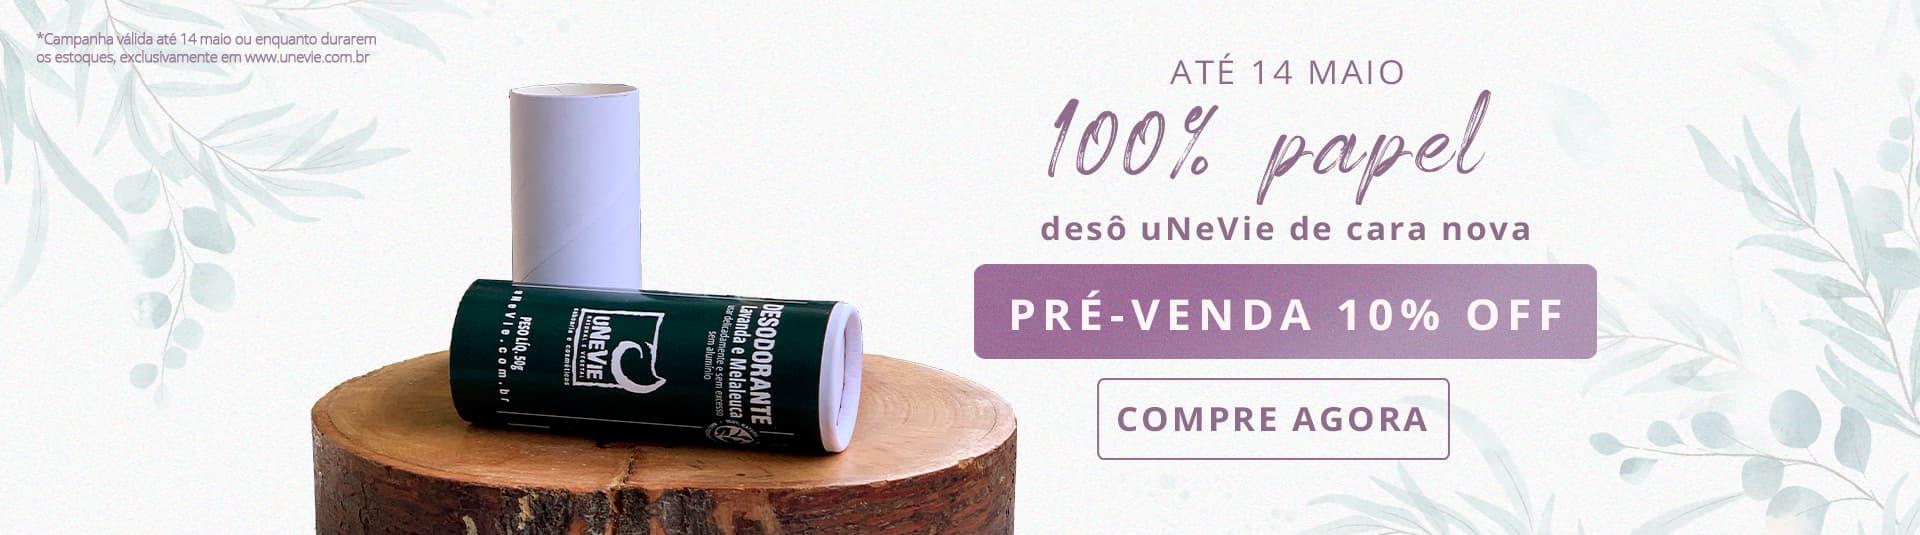 LR 2021-05-03 pre-venda desodorantes papel